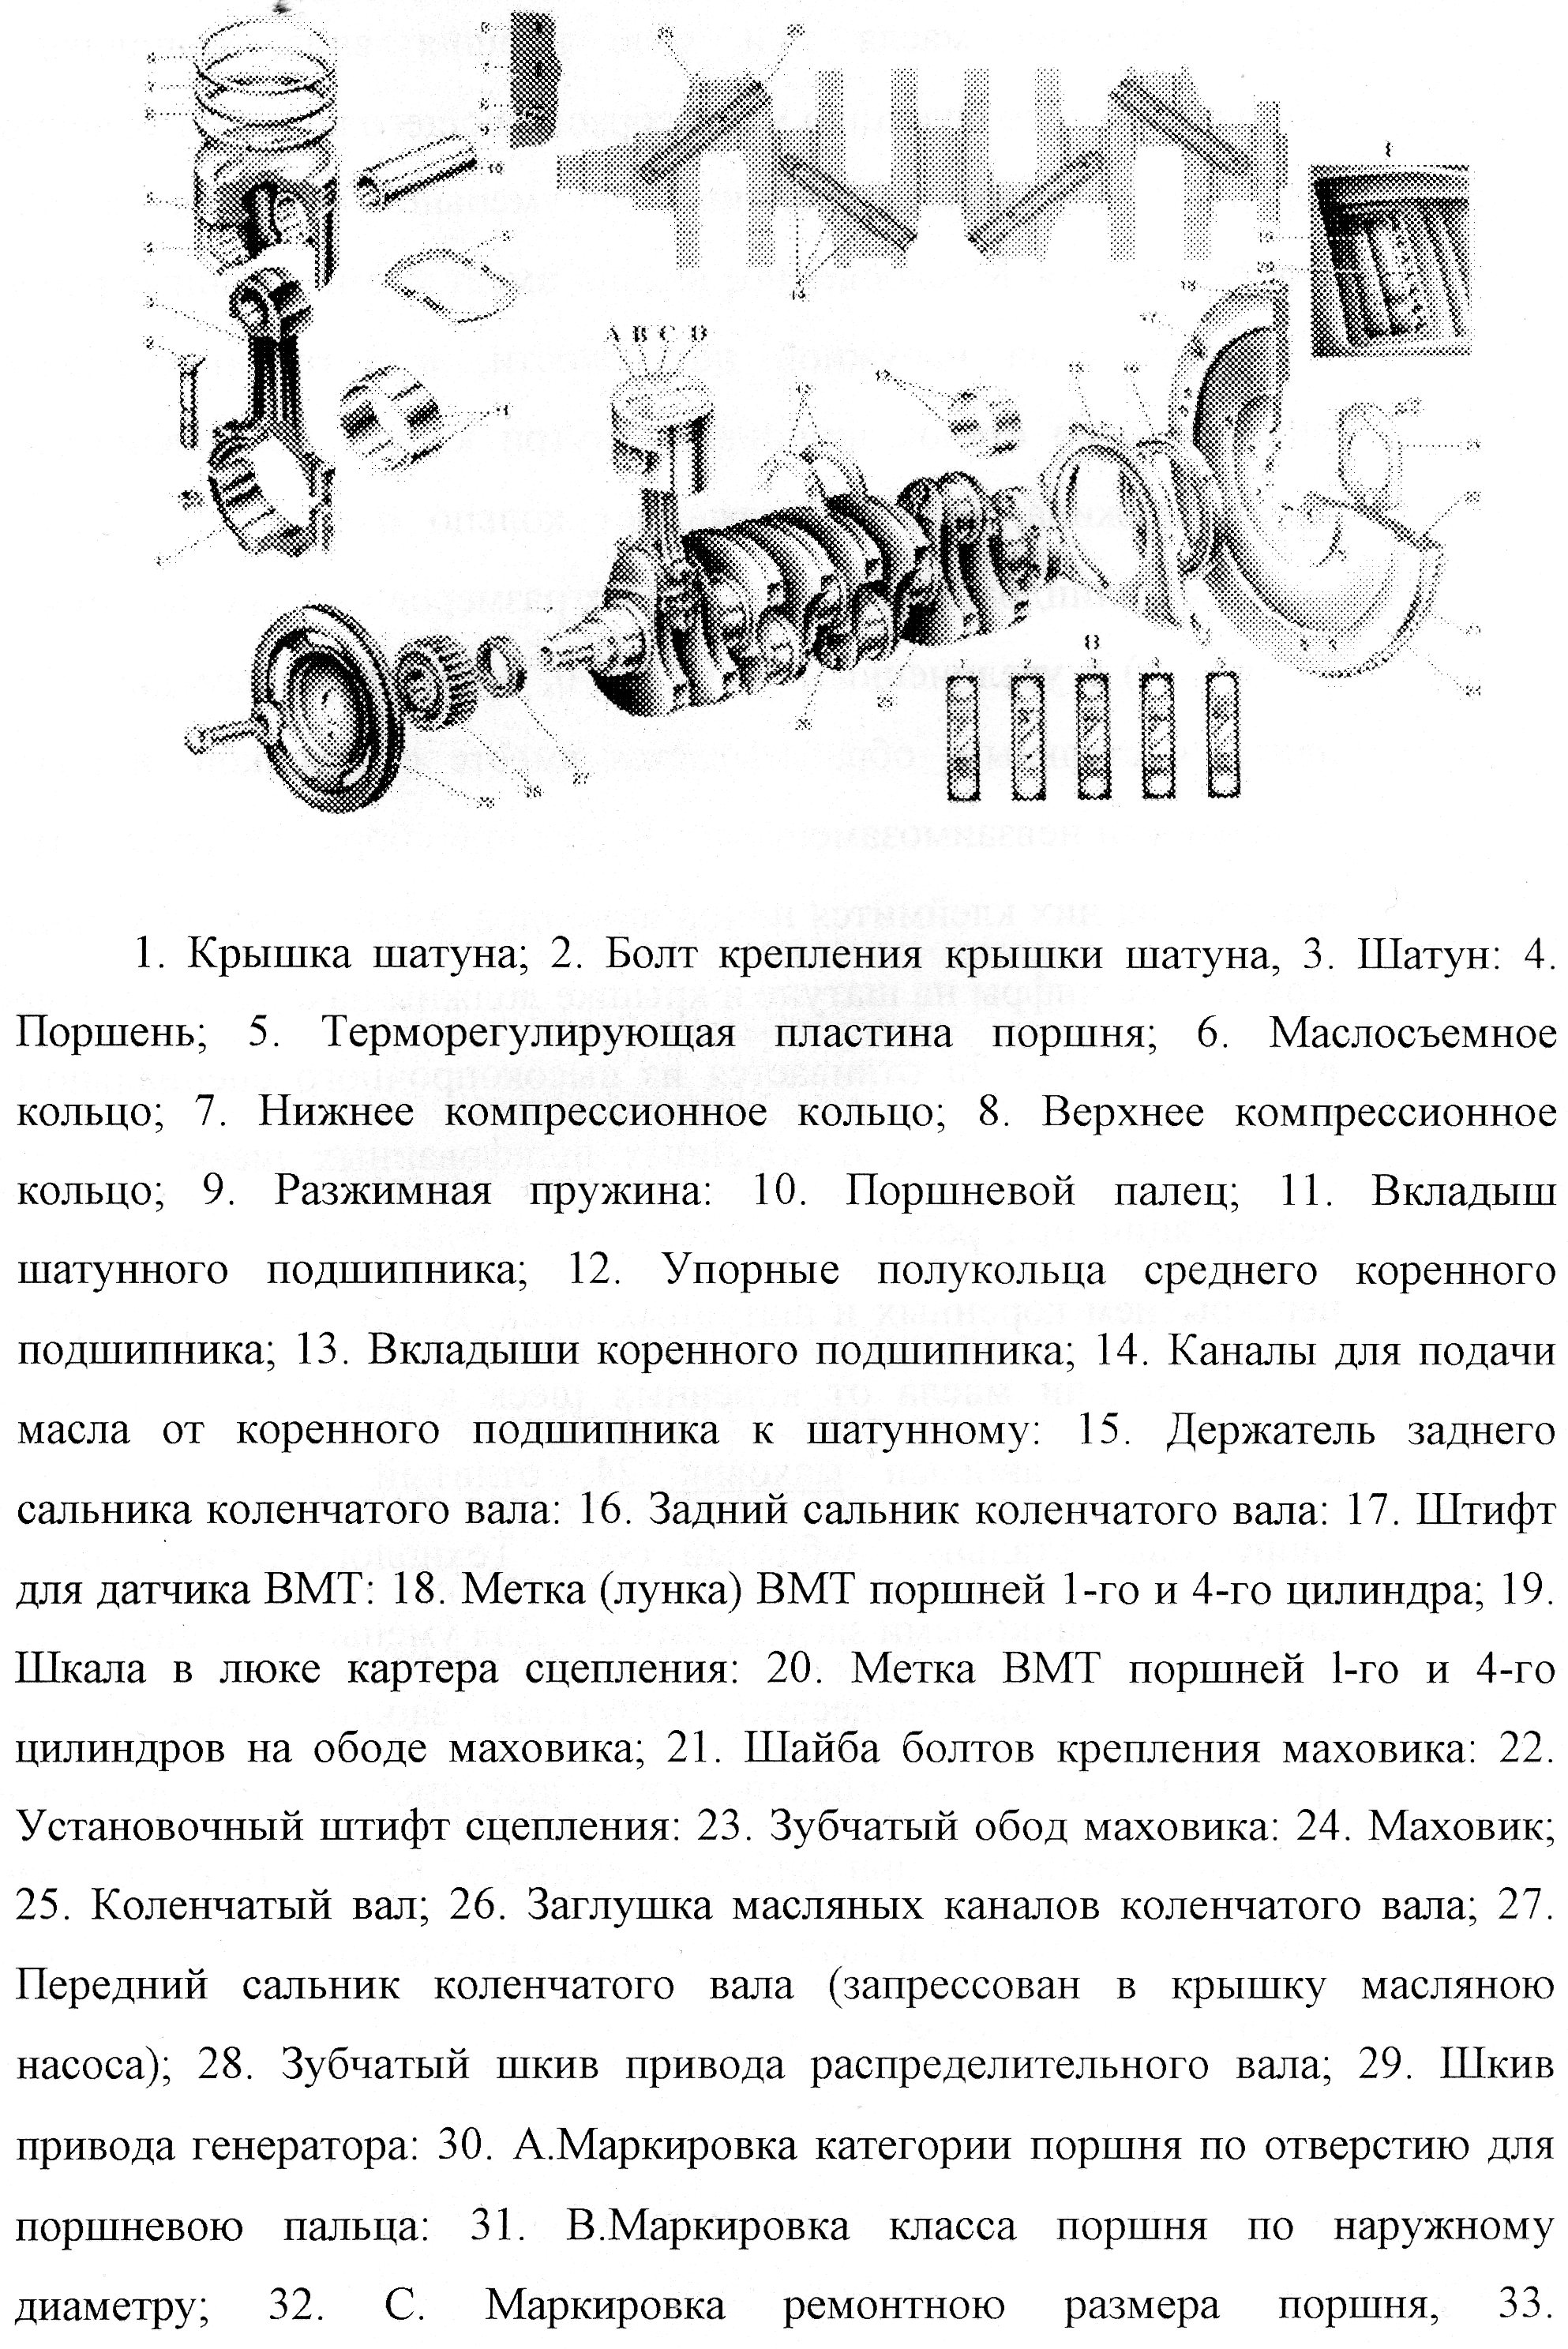 C:\Users\Василий Мельченко\Pictures\img594.jpg